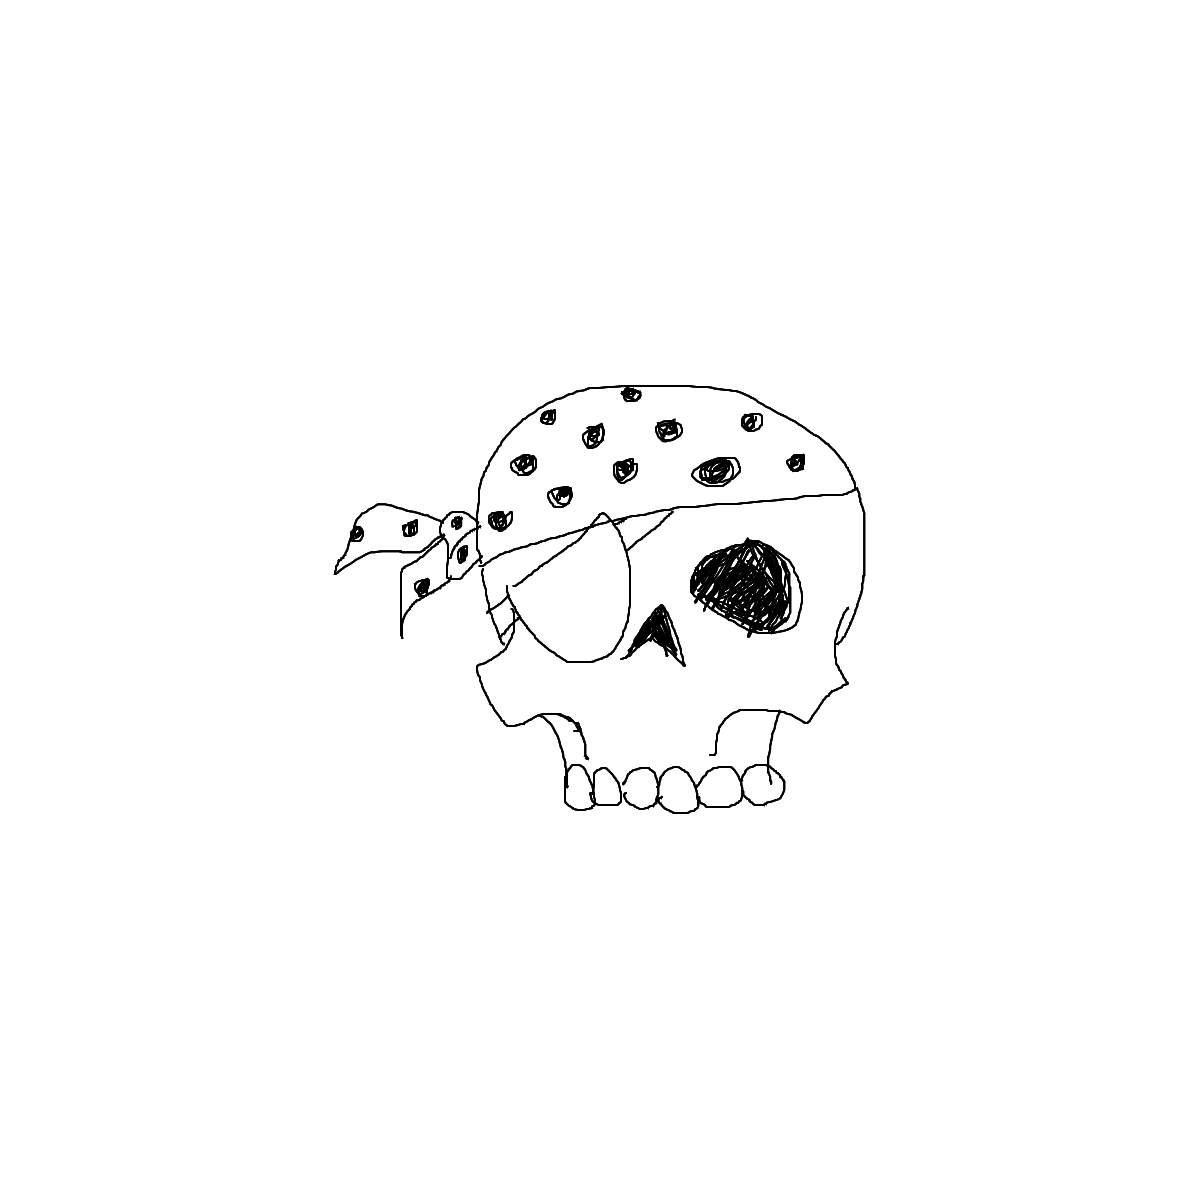 BAAAM drawing#697 lat:43.3220443725585940lng: -1.9884324073791504